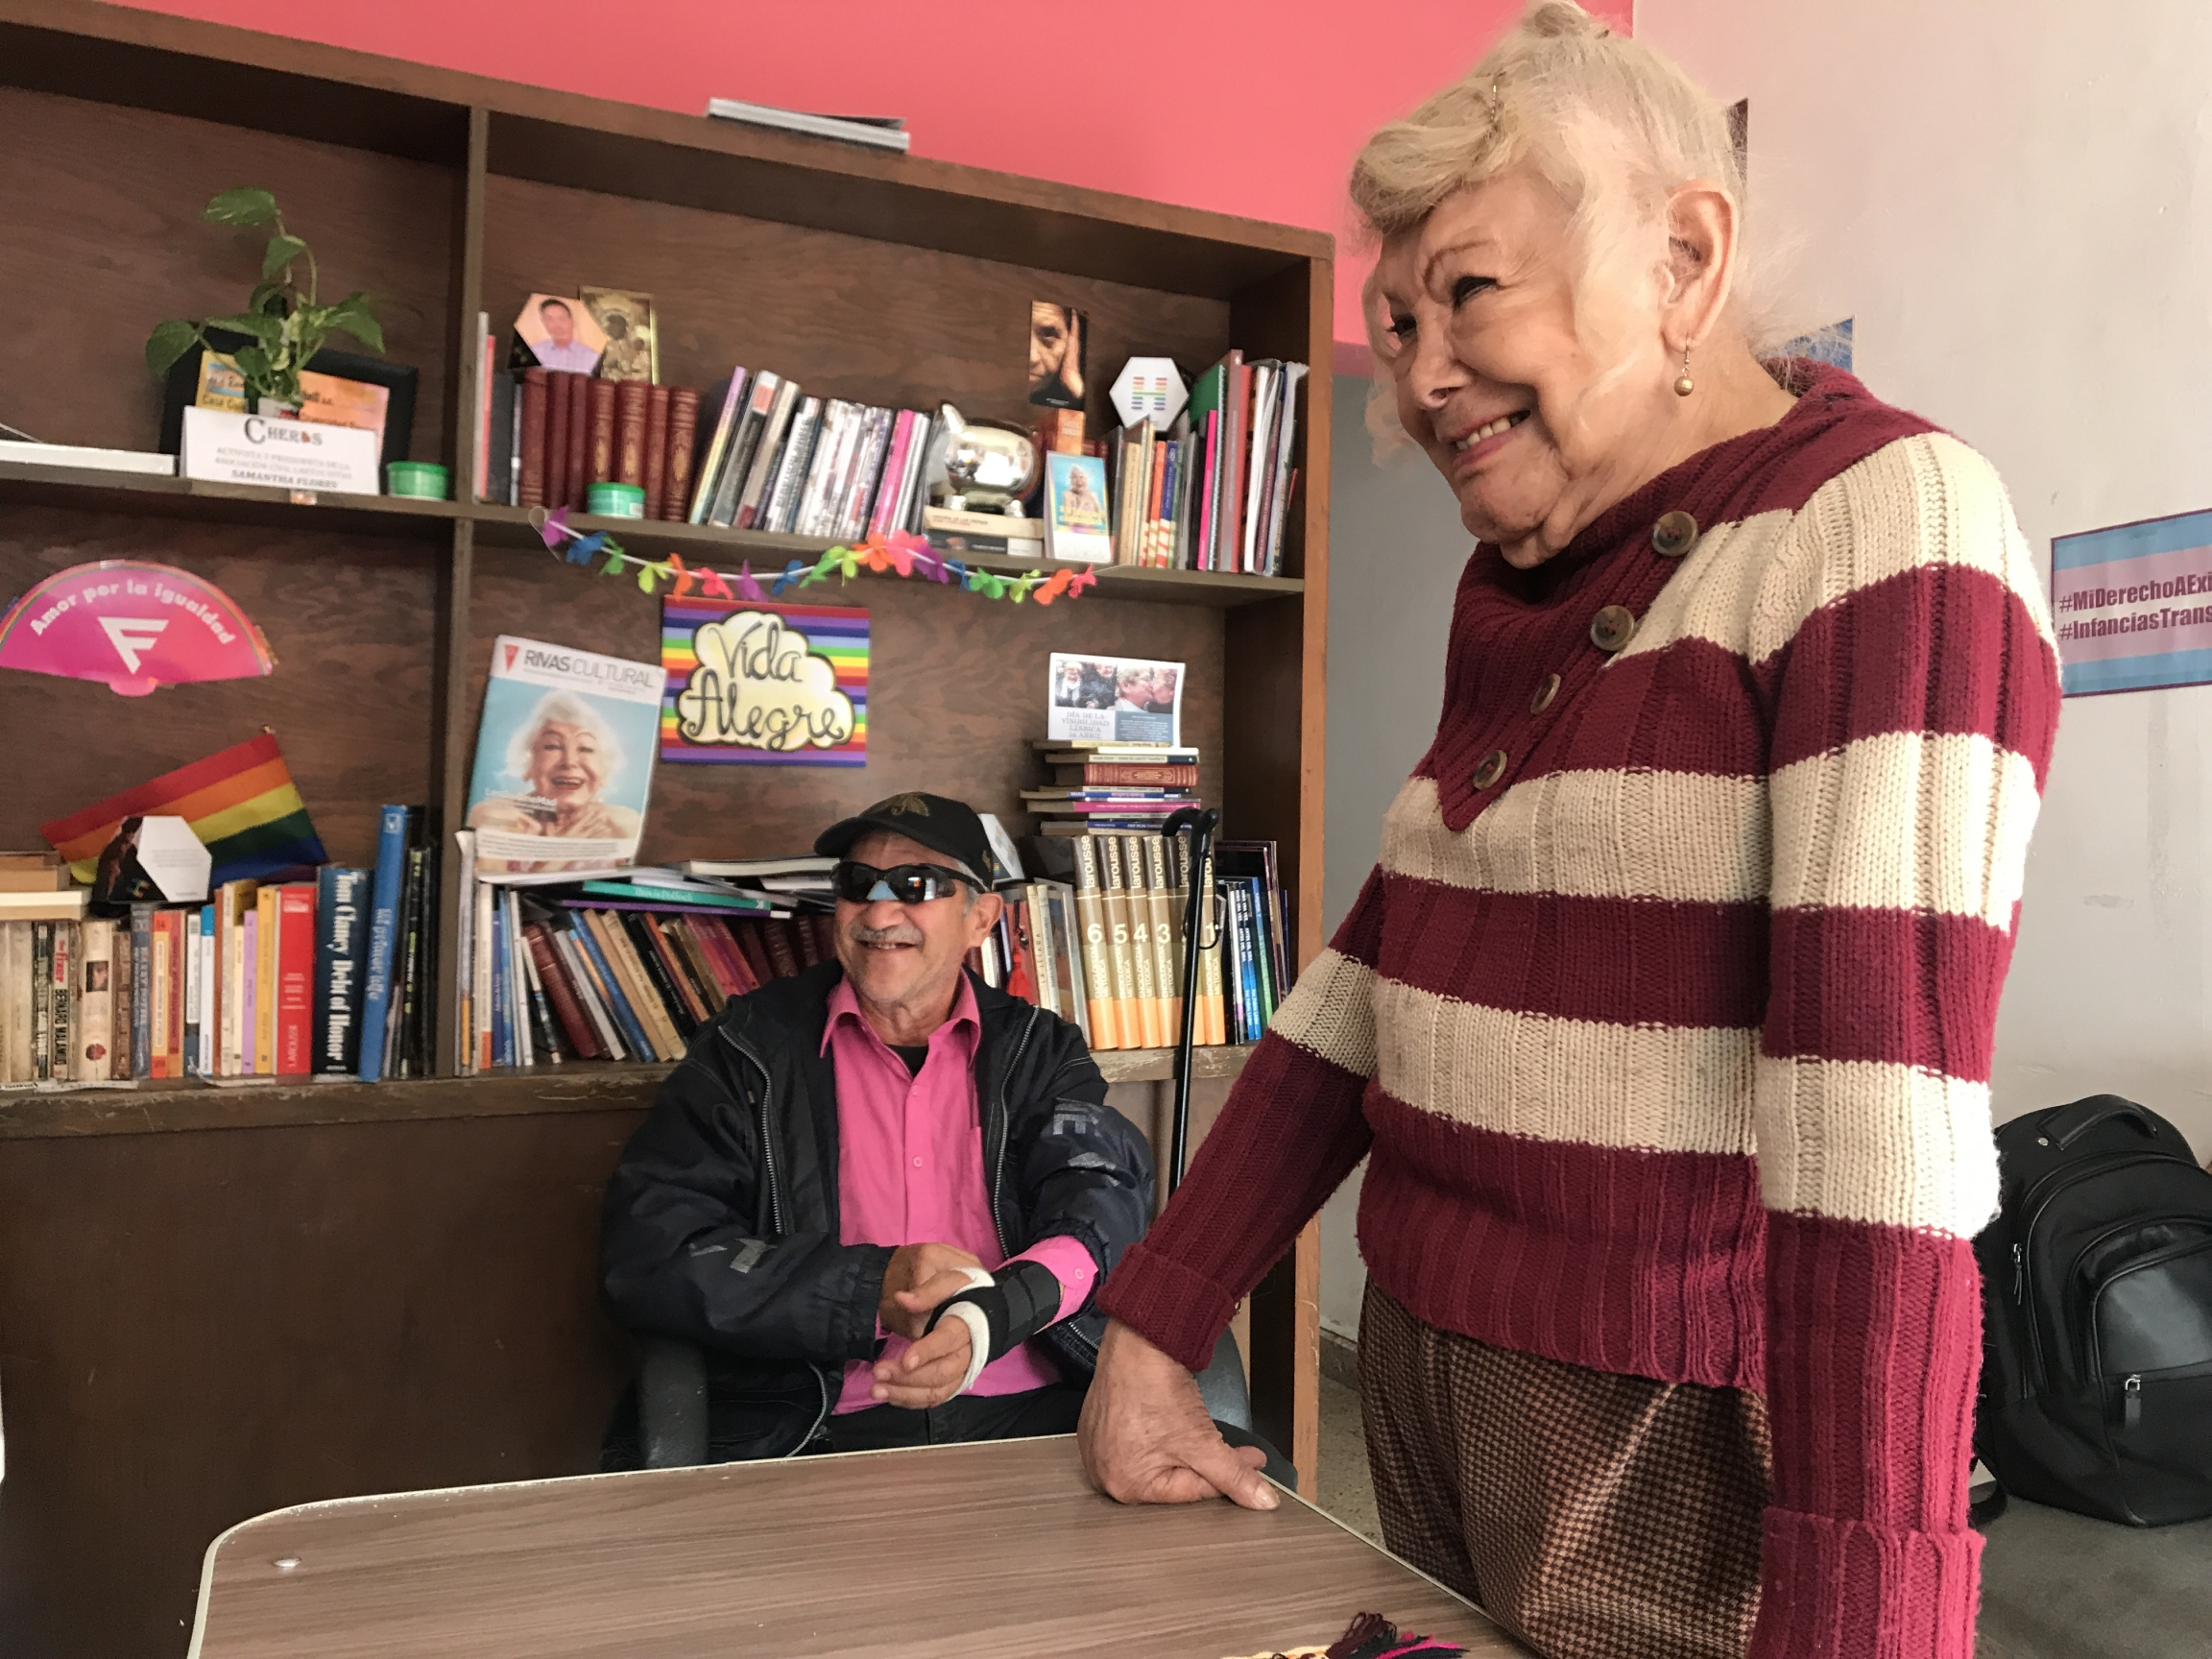 A woman talks with friends in a center near a bookshelf